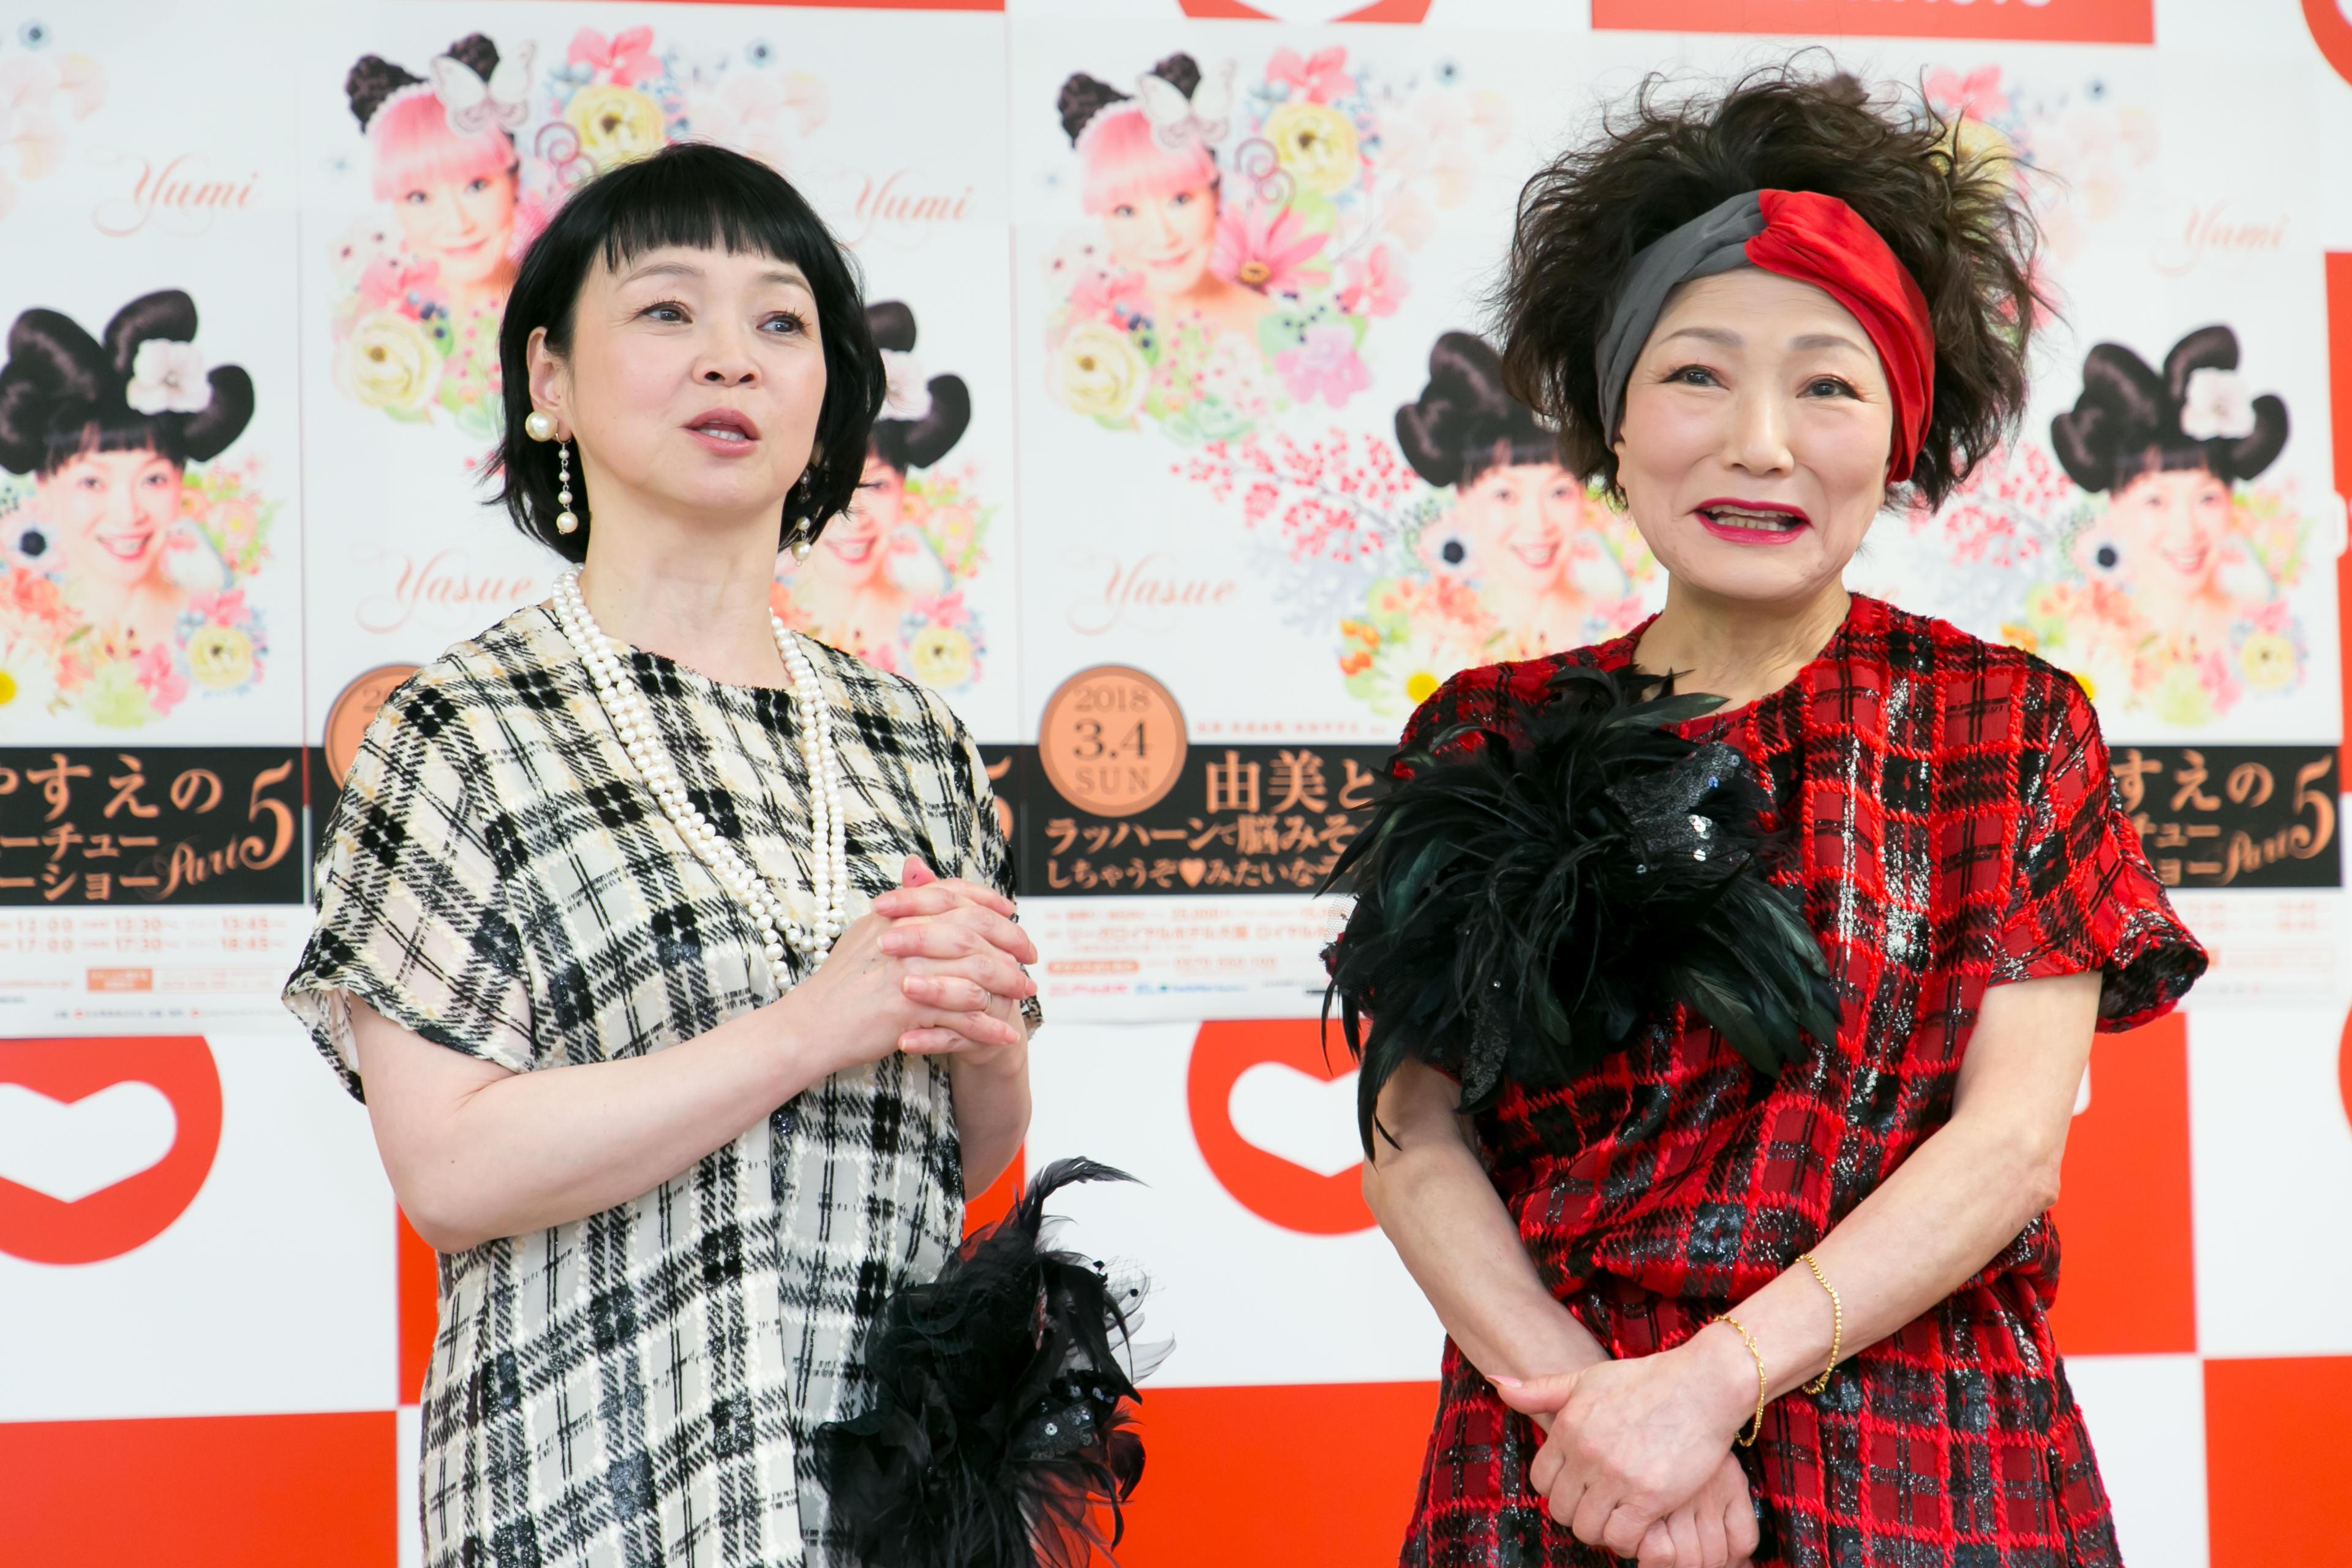 http://news.yoshimoto.co.jp/20171219144029-f043a6b710950079e58c810449f1a25686726b56.jpg